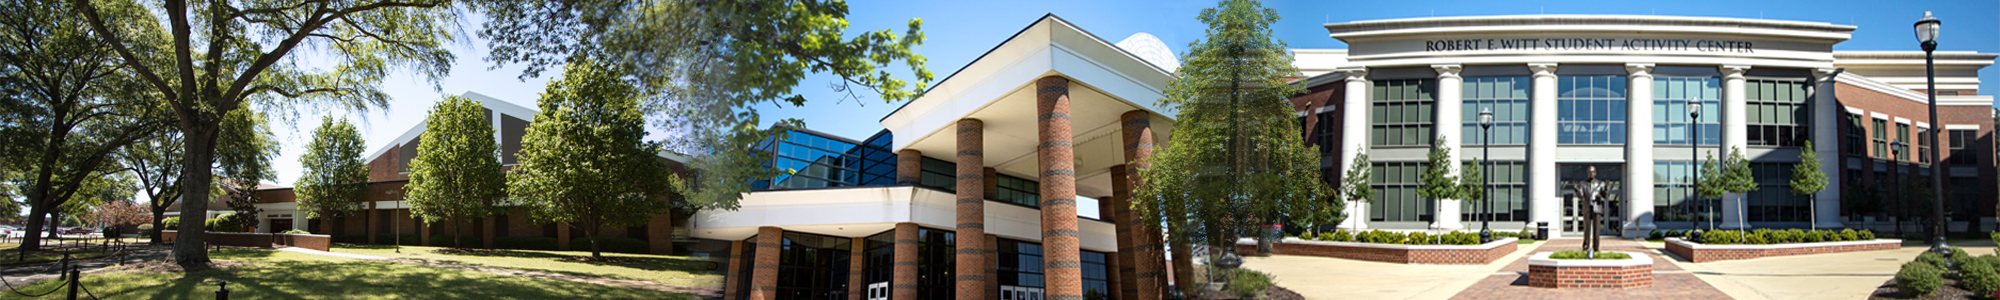 Facilities - University Recreation